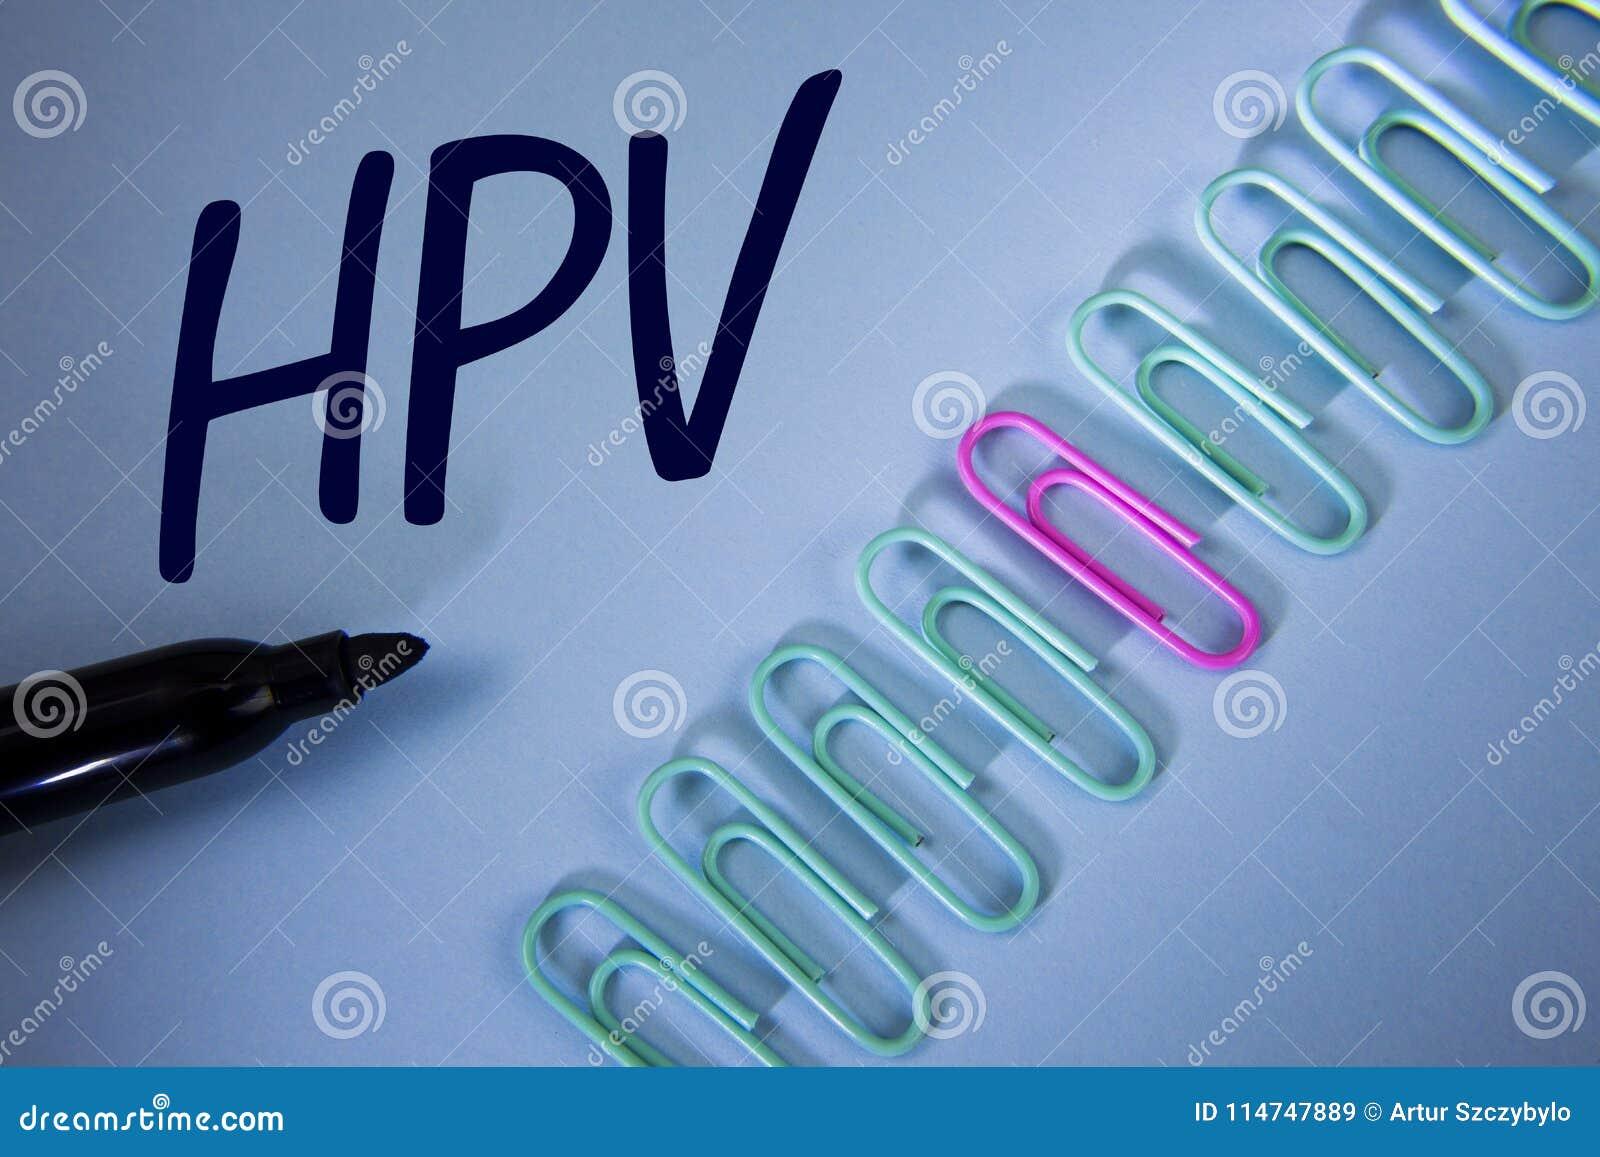 Papilloma meaning of the word, Human papillomavirus meaning word